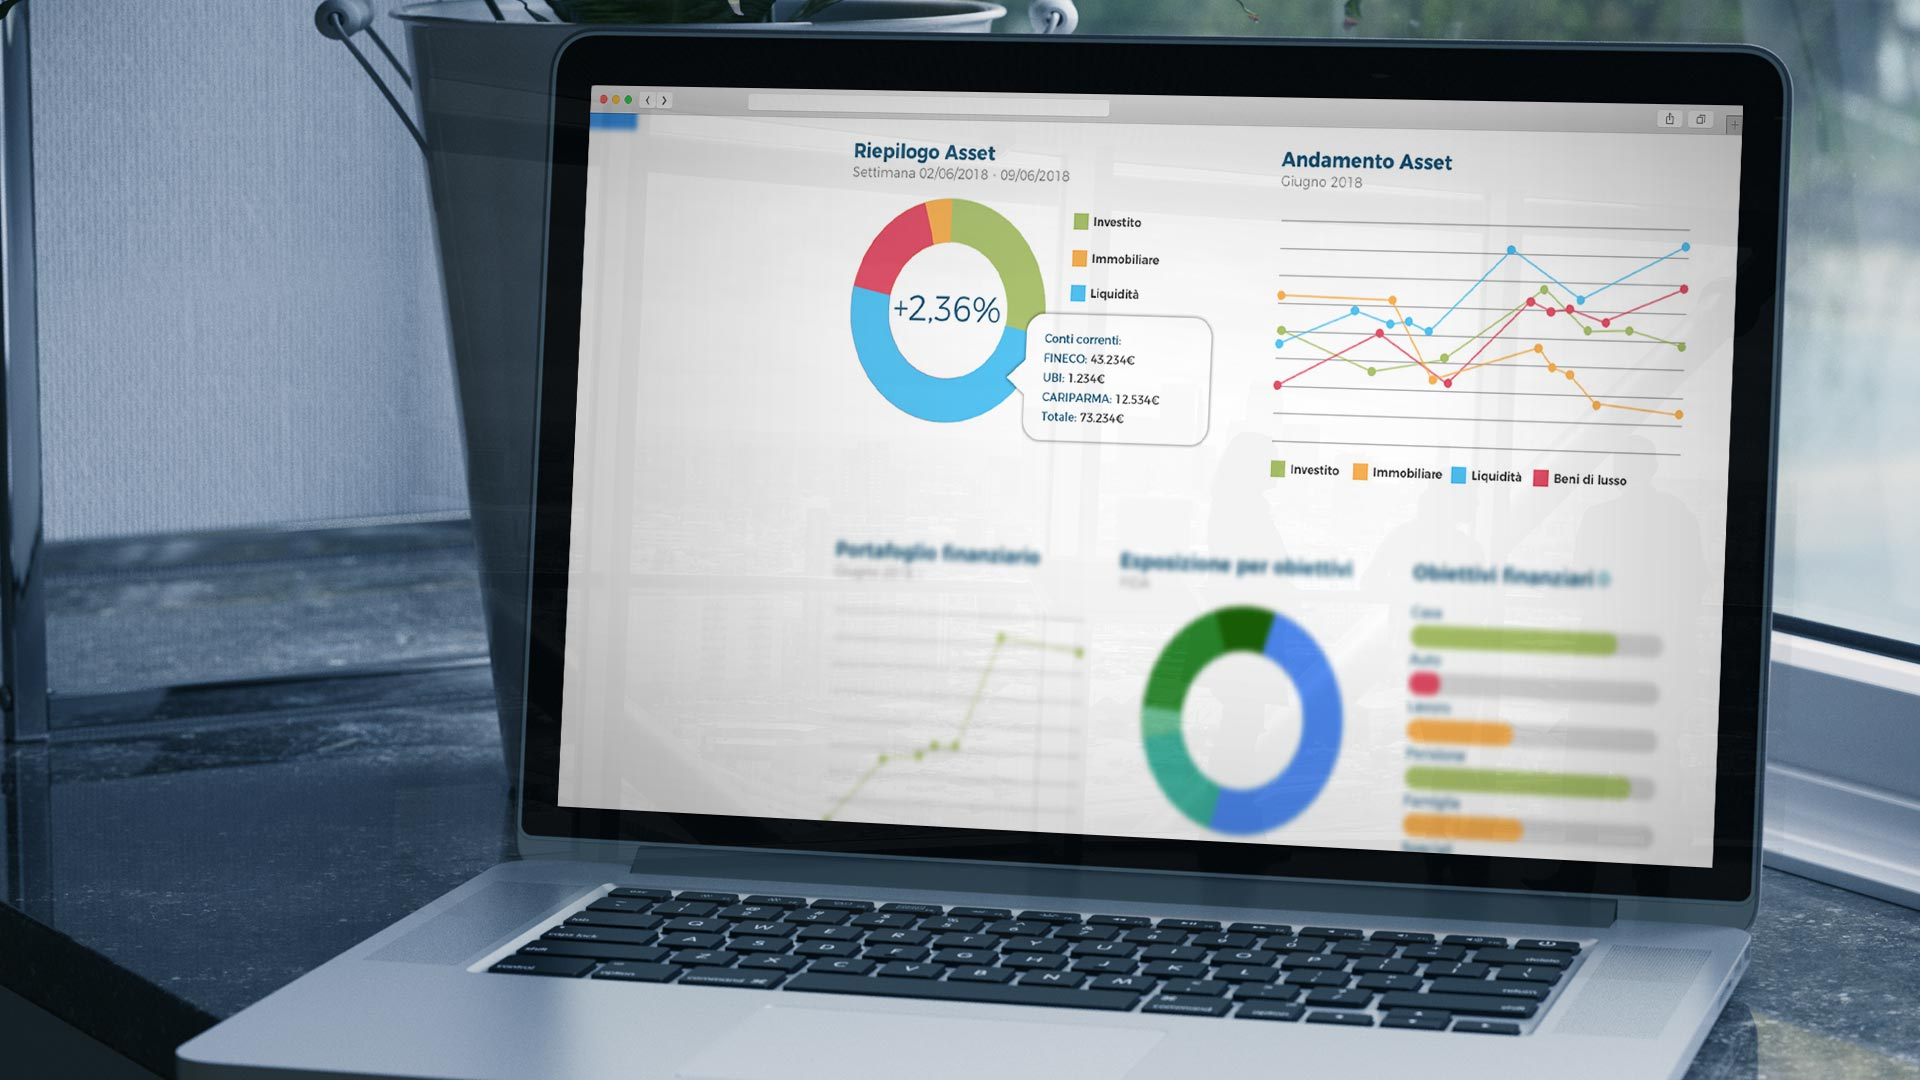 Piattaforma Fairvalyou Riepilogo Asset finanziari e patrimoniali